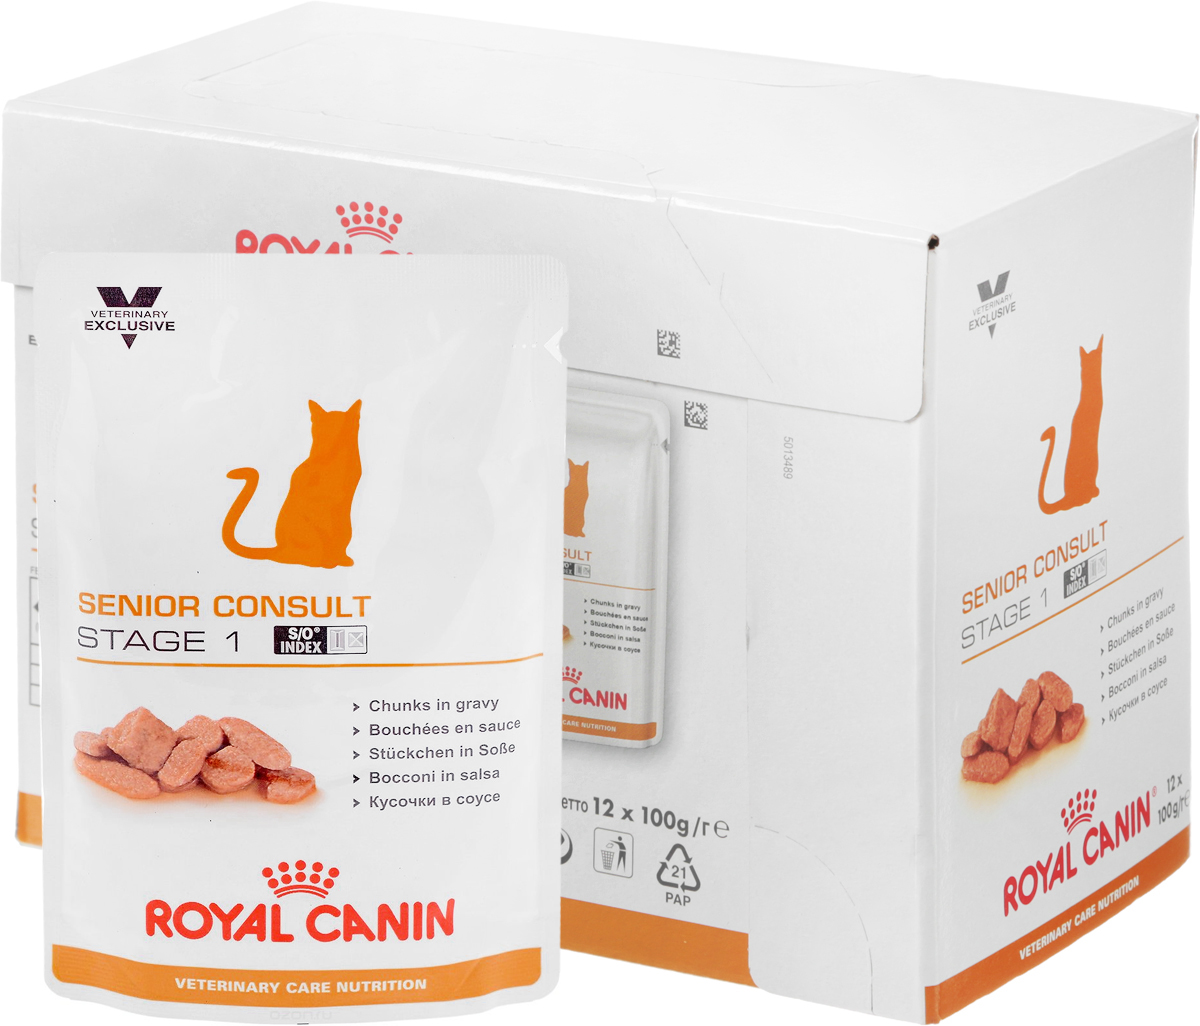 Консервы Royal Canin  Senior Consult Stage 1  для кошек старше 7 лет, 100 г, 12 шт